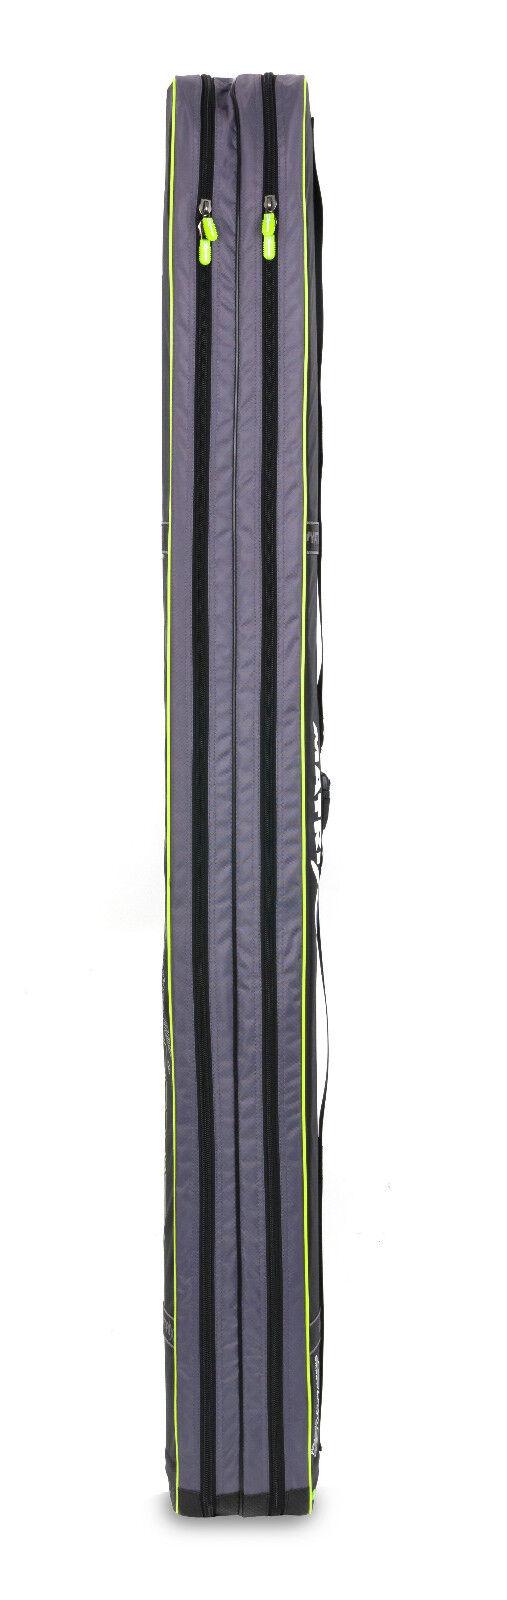 Fox Matrix Rutenfutteral Ethos Pro 4 Rod Compact Case Futteral Rutenfutteral Matrix Rutentasche a995d1